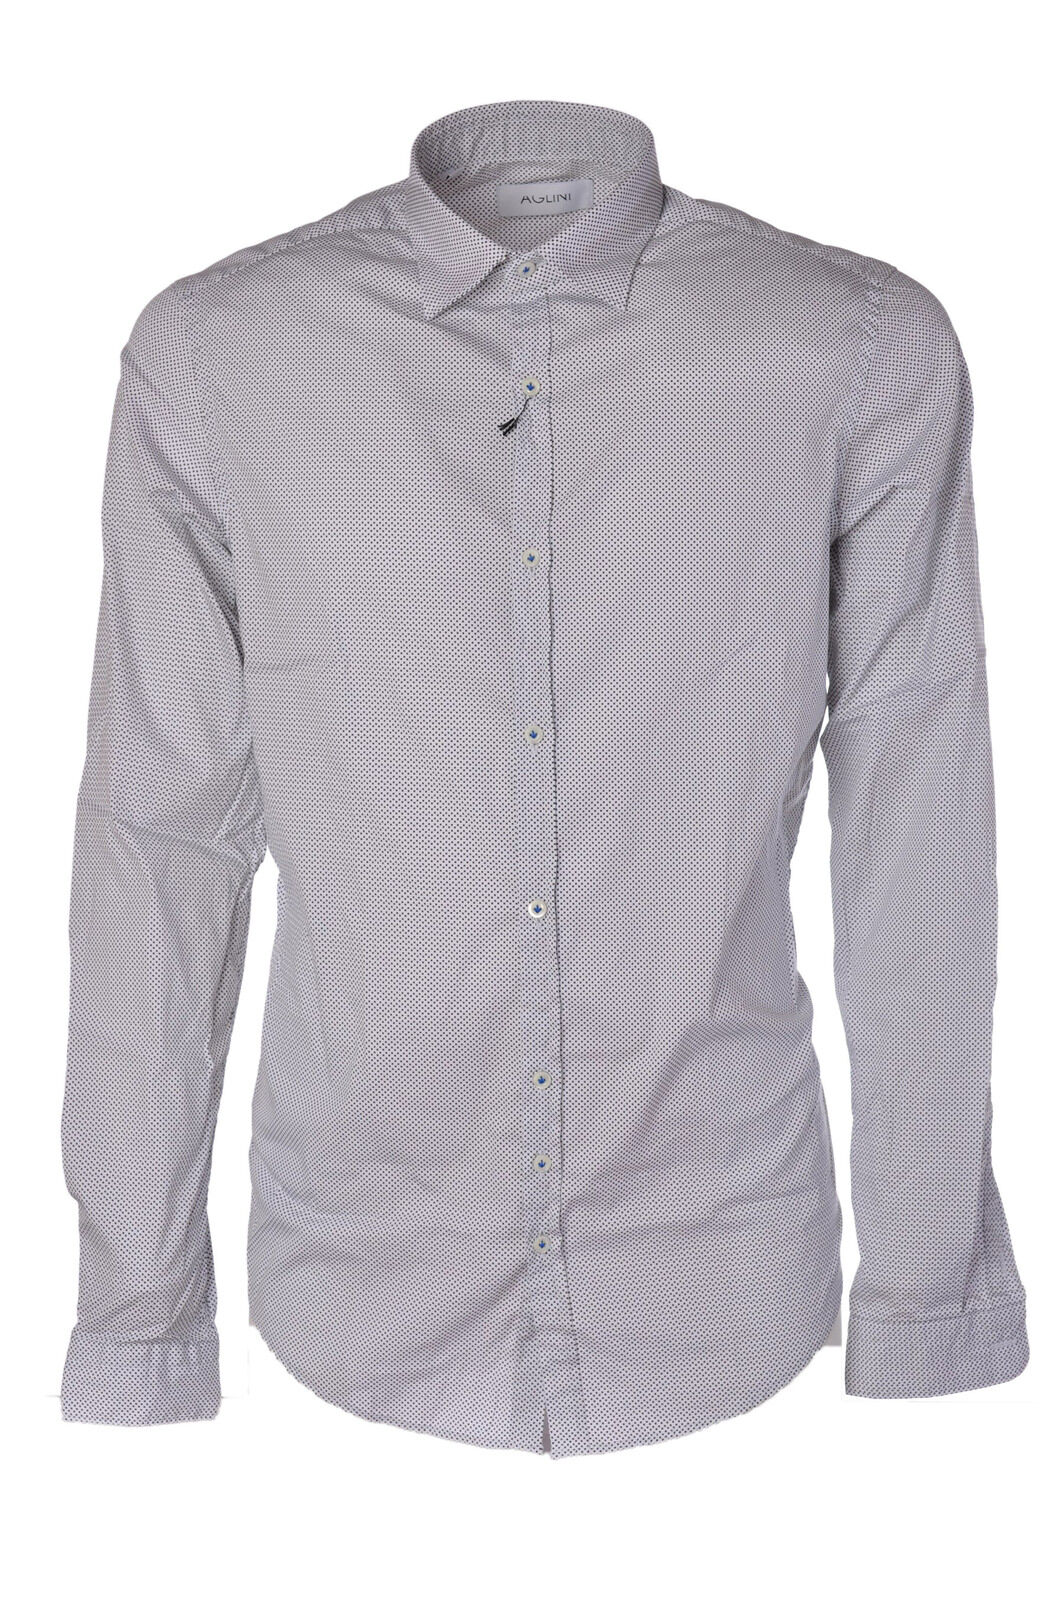 Aglini - Shirts-Shirt - Man - White - 475515C181141